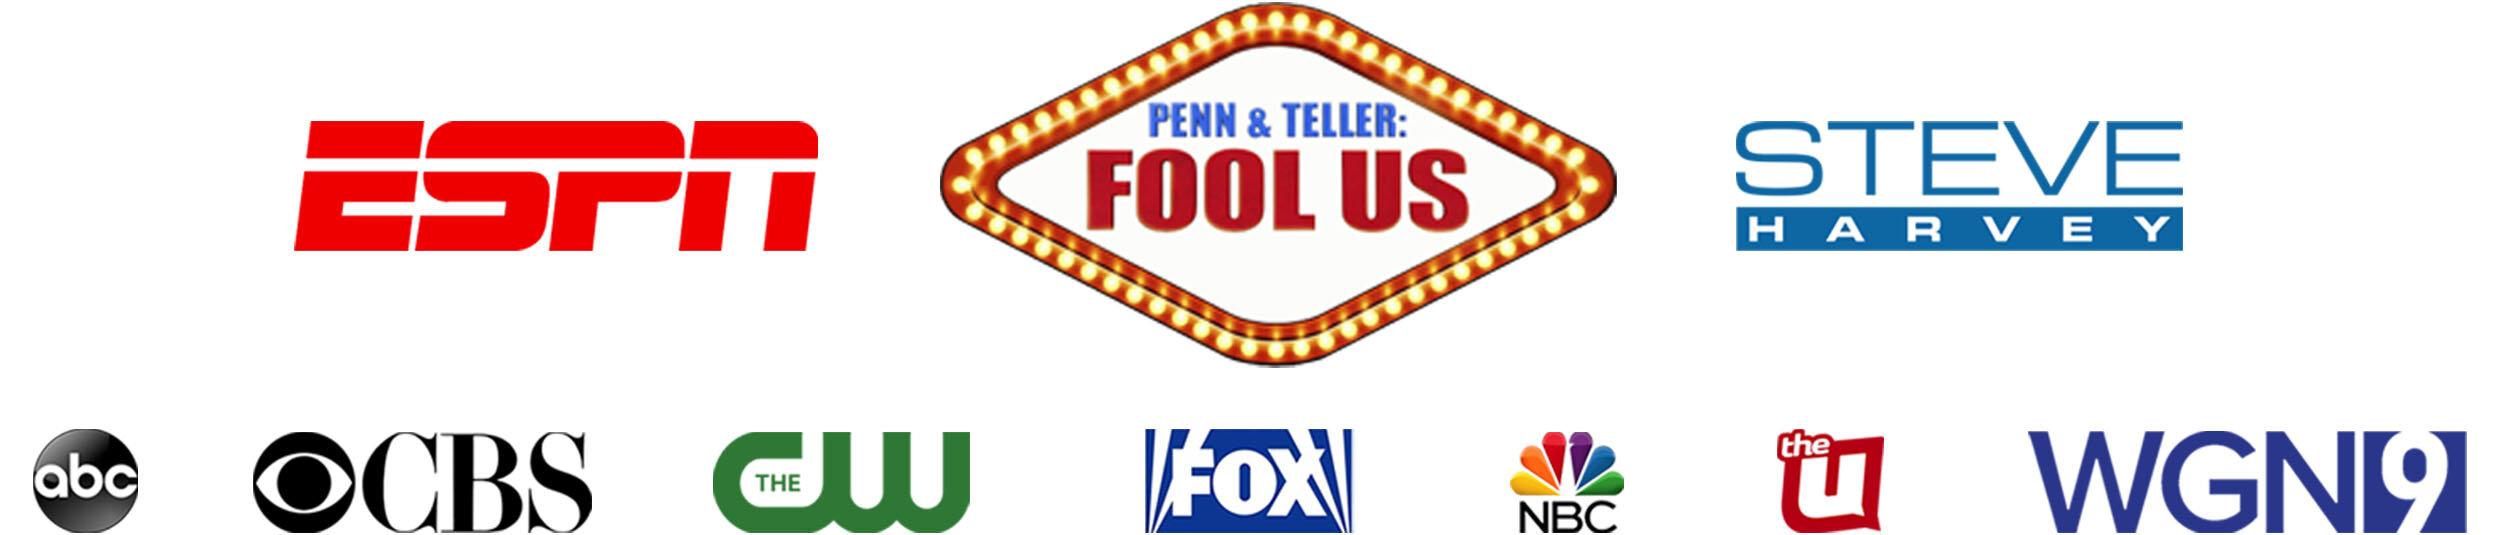 as seen on tv logos 2.jpg